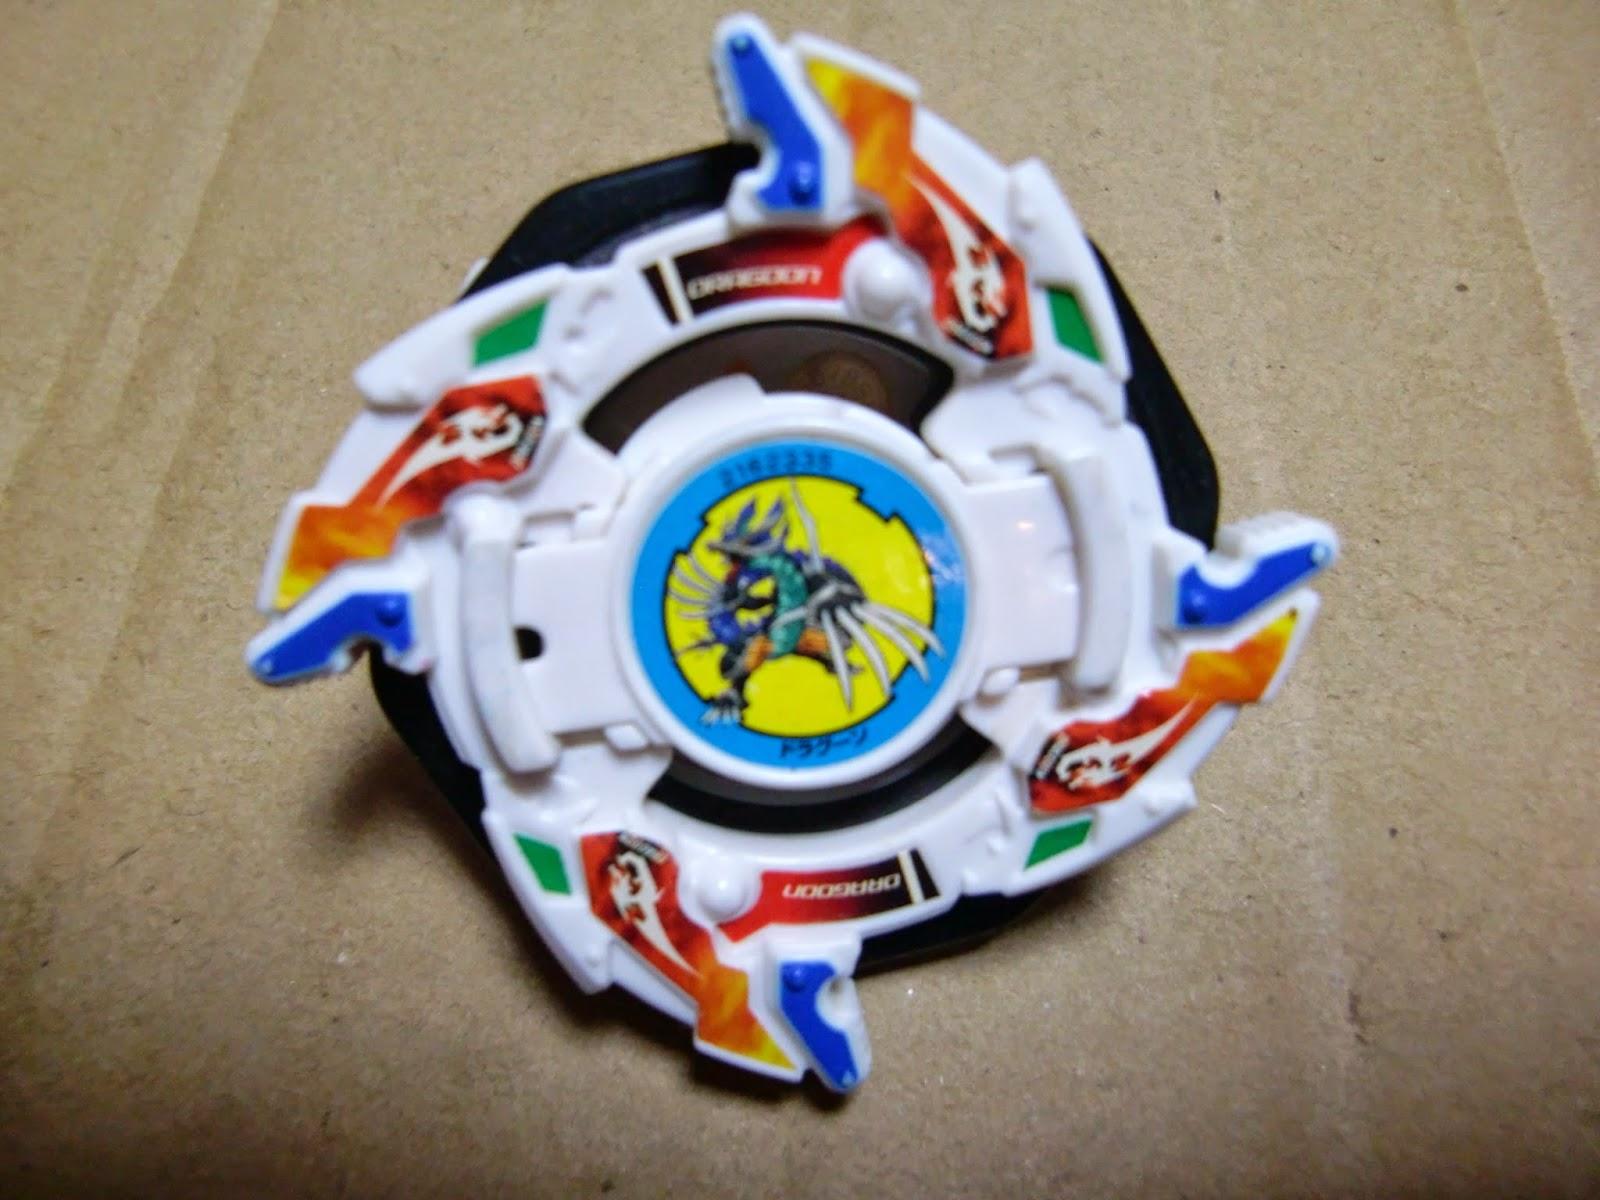 Toku Taku Toys' Beyblade Collection: A-69 Dragoon V2 - A ...  Toku Taku Toys&...